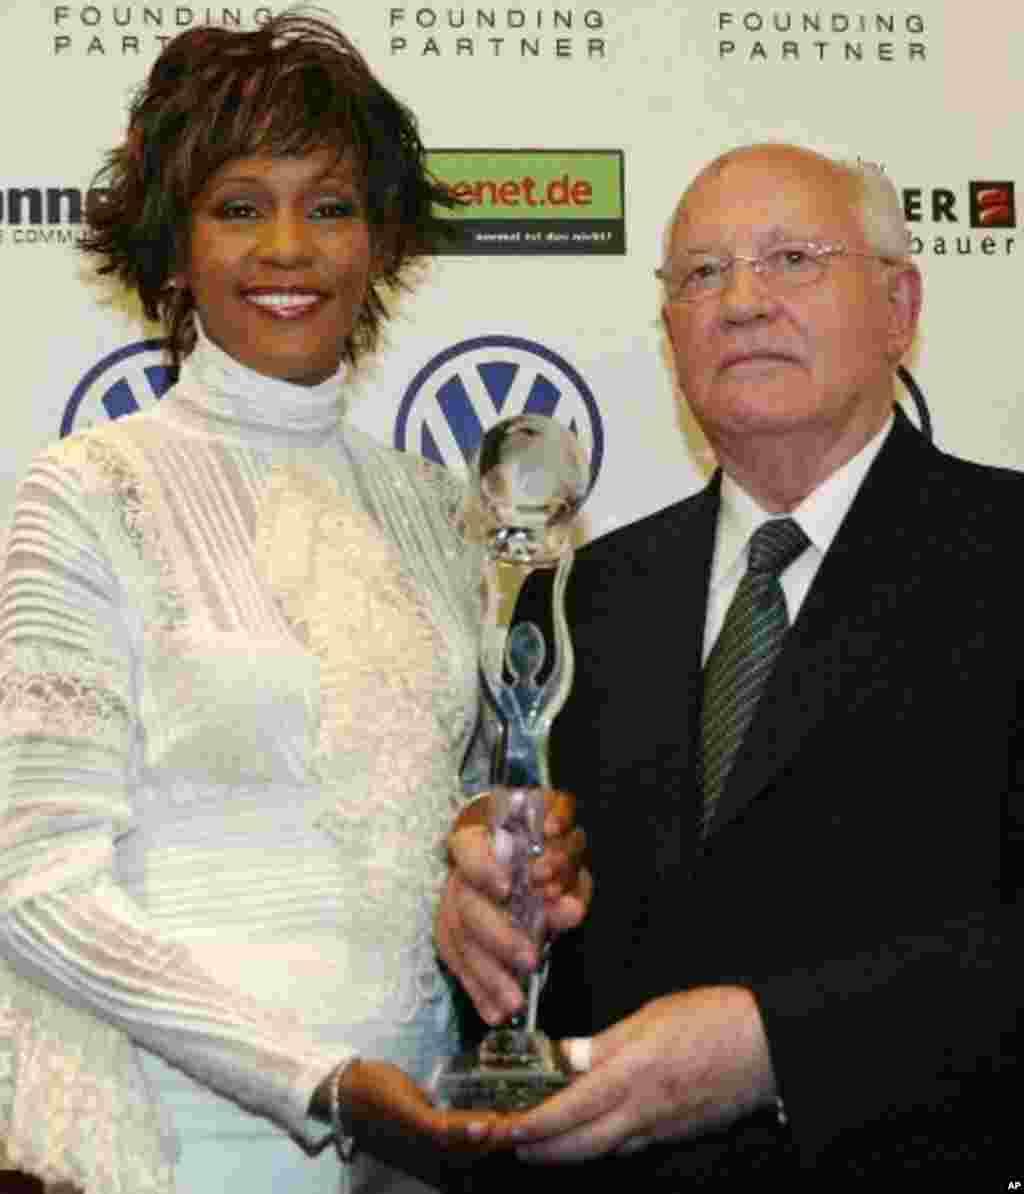 Former Soviet President Mikhail Gorbachev, right, and US singer Whitney Houston pose with her award prior the beginning of the World Women's Award ceremony in Hamburg's Congress Center, northern Germany, Wednesday, June 9, 2004. Whitney Houston will rece